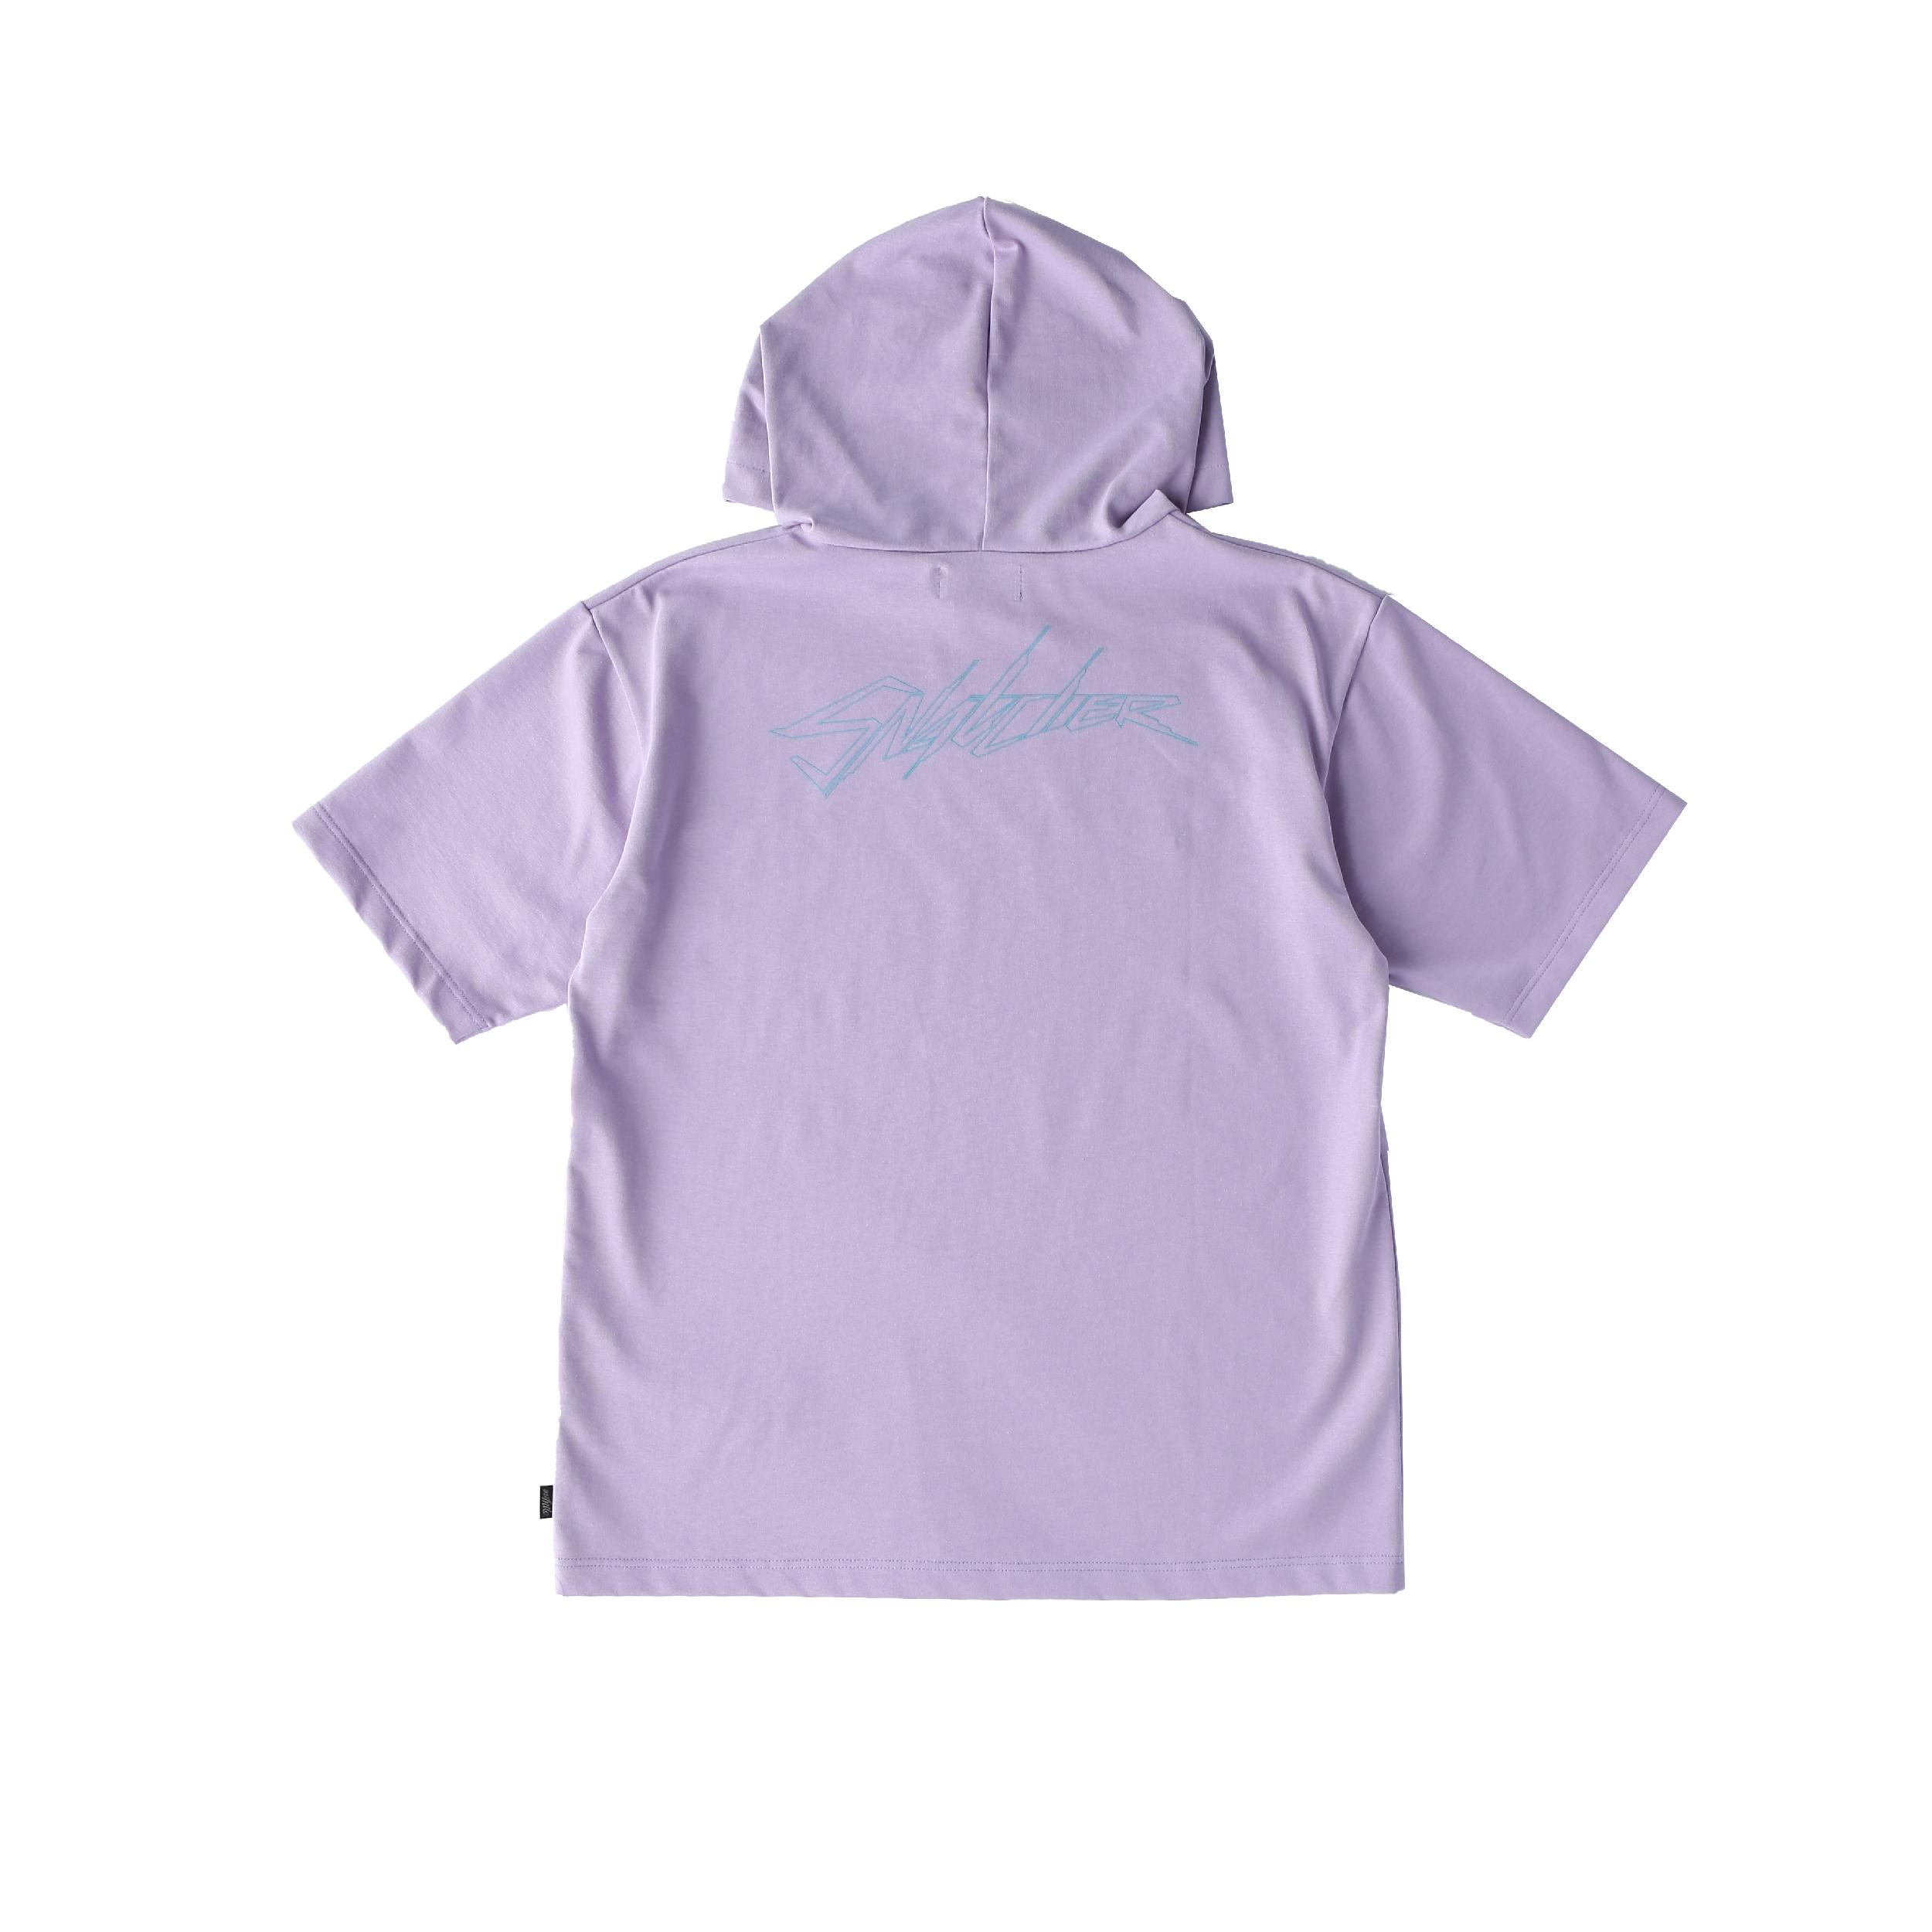 SNATCHER hoodie T-shirt / PURPLE - 画像2